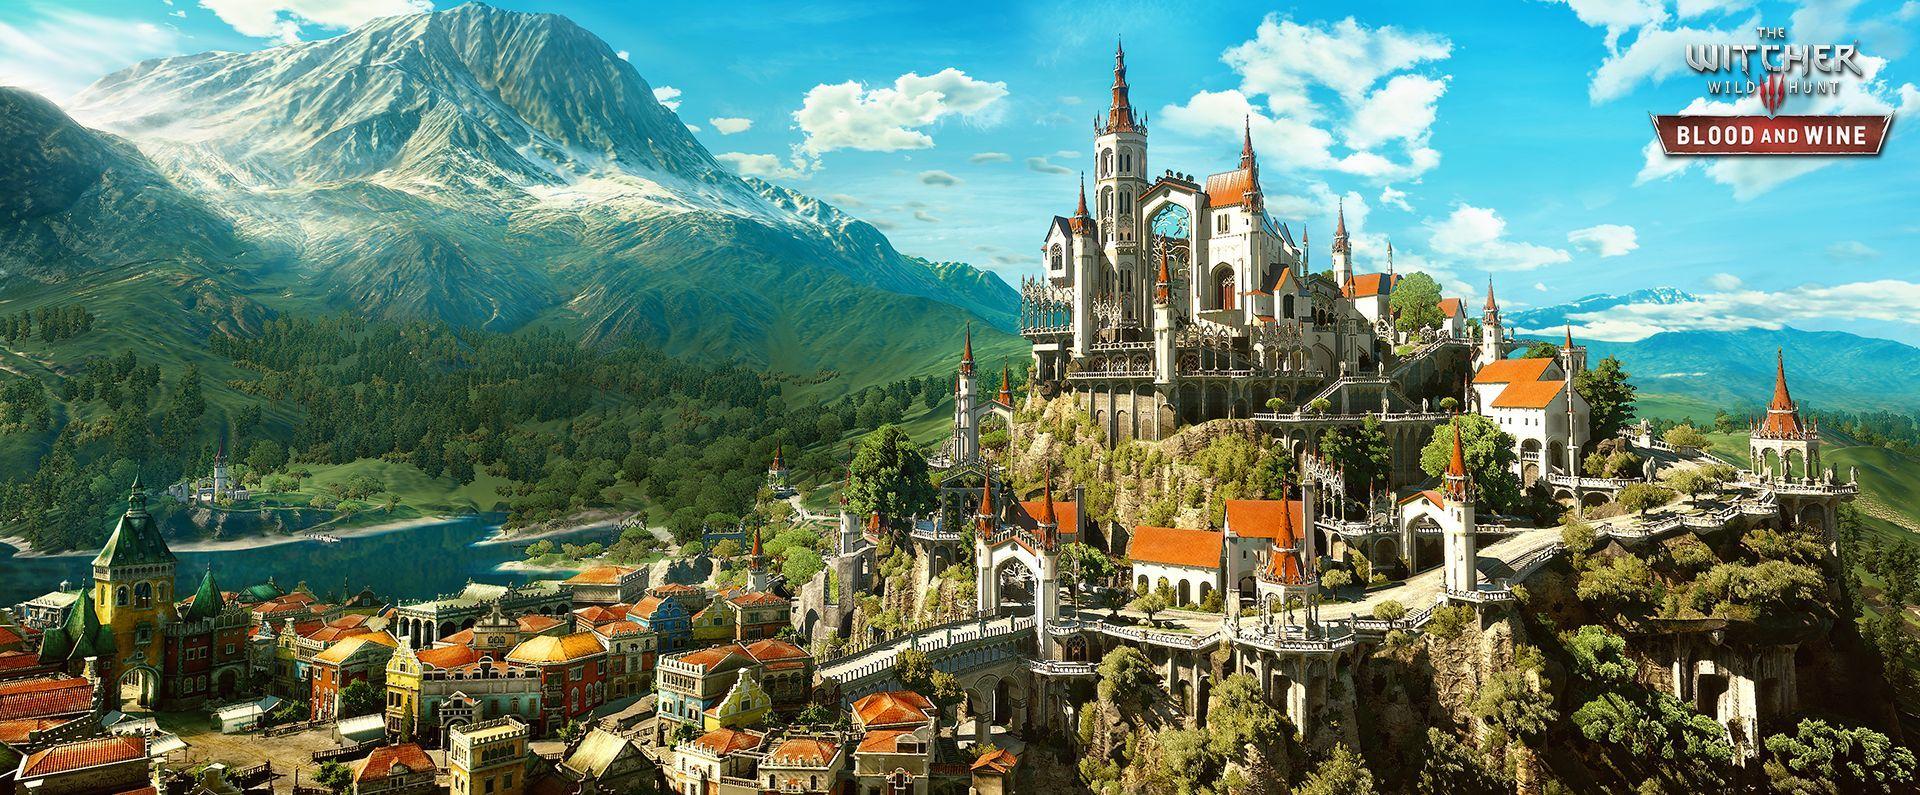 The Witcher 3: Wild Hunt - Blood & Wine (PC) - 13